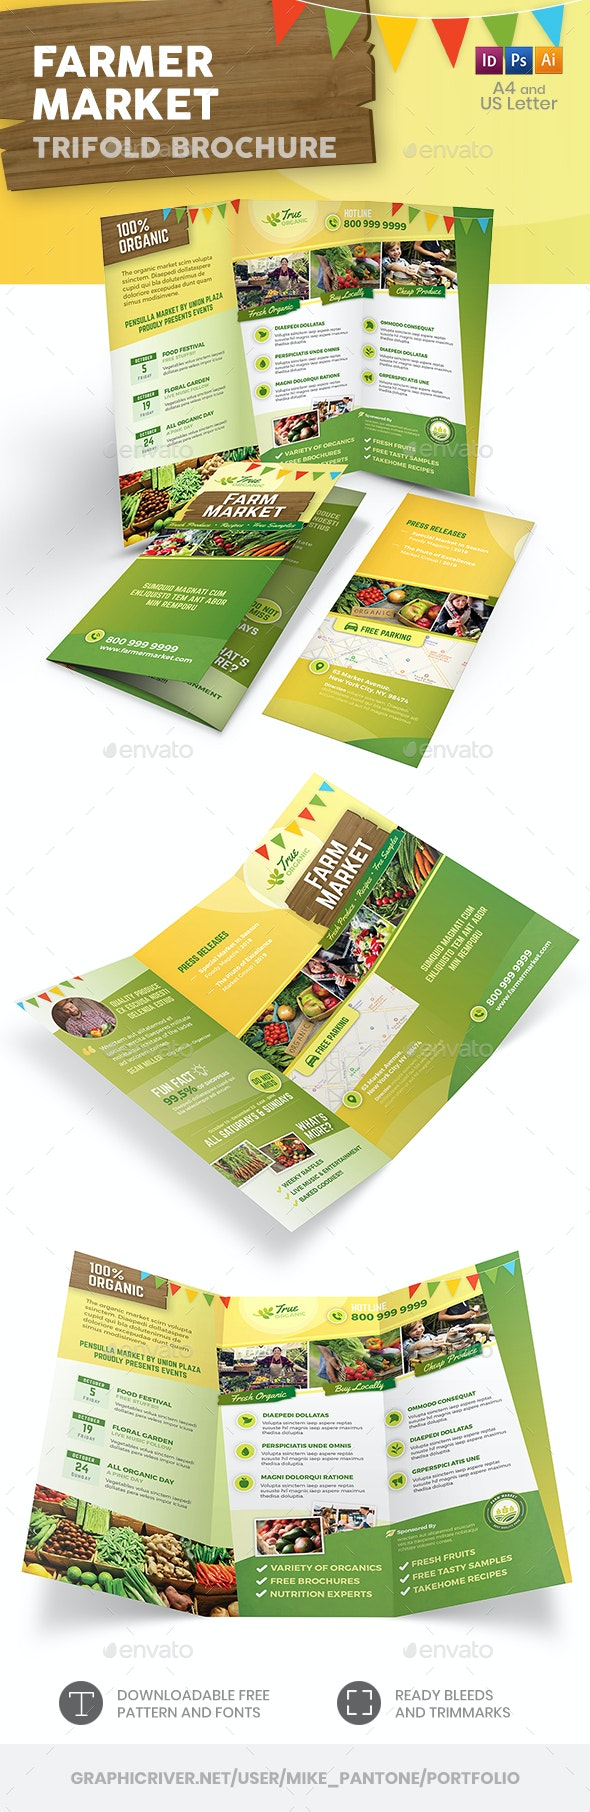 Farmer Market Trifold Brochure - Informational Brochures